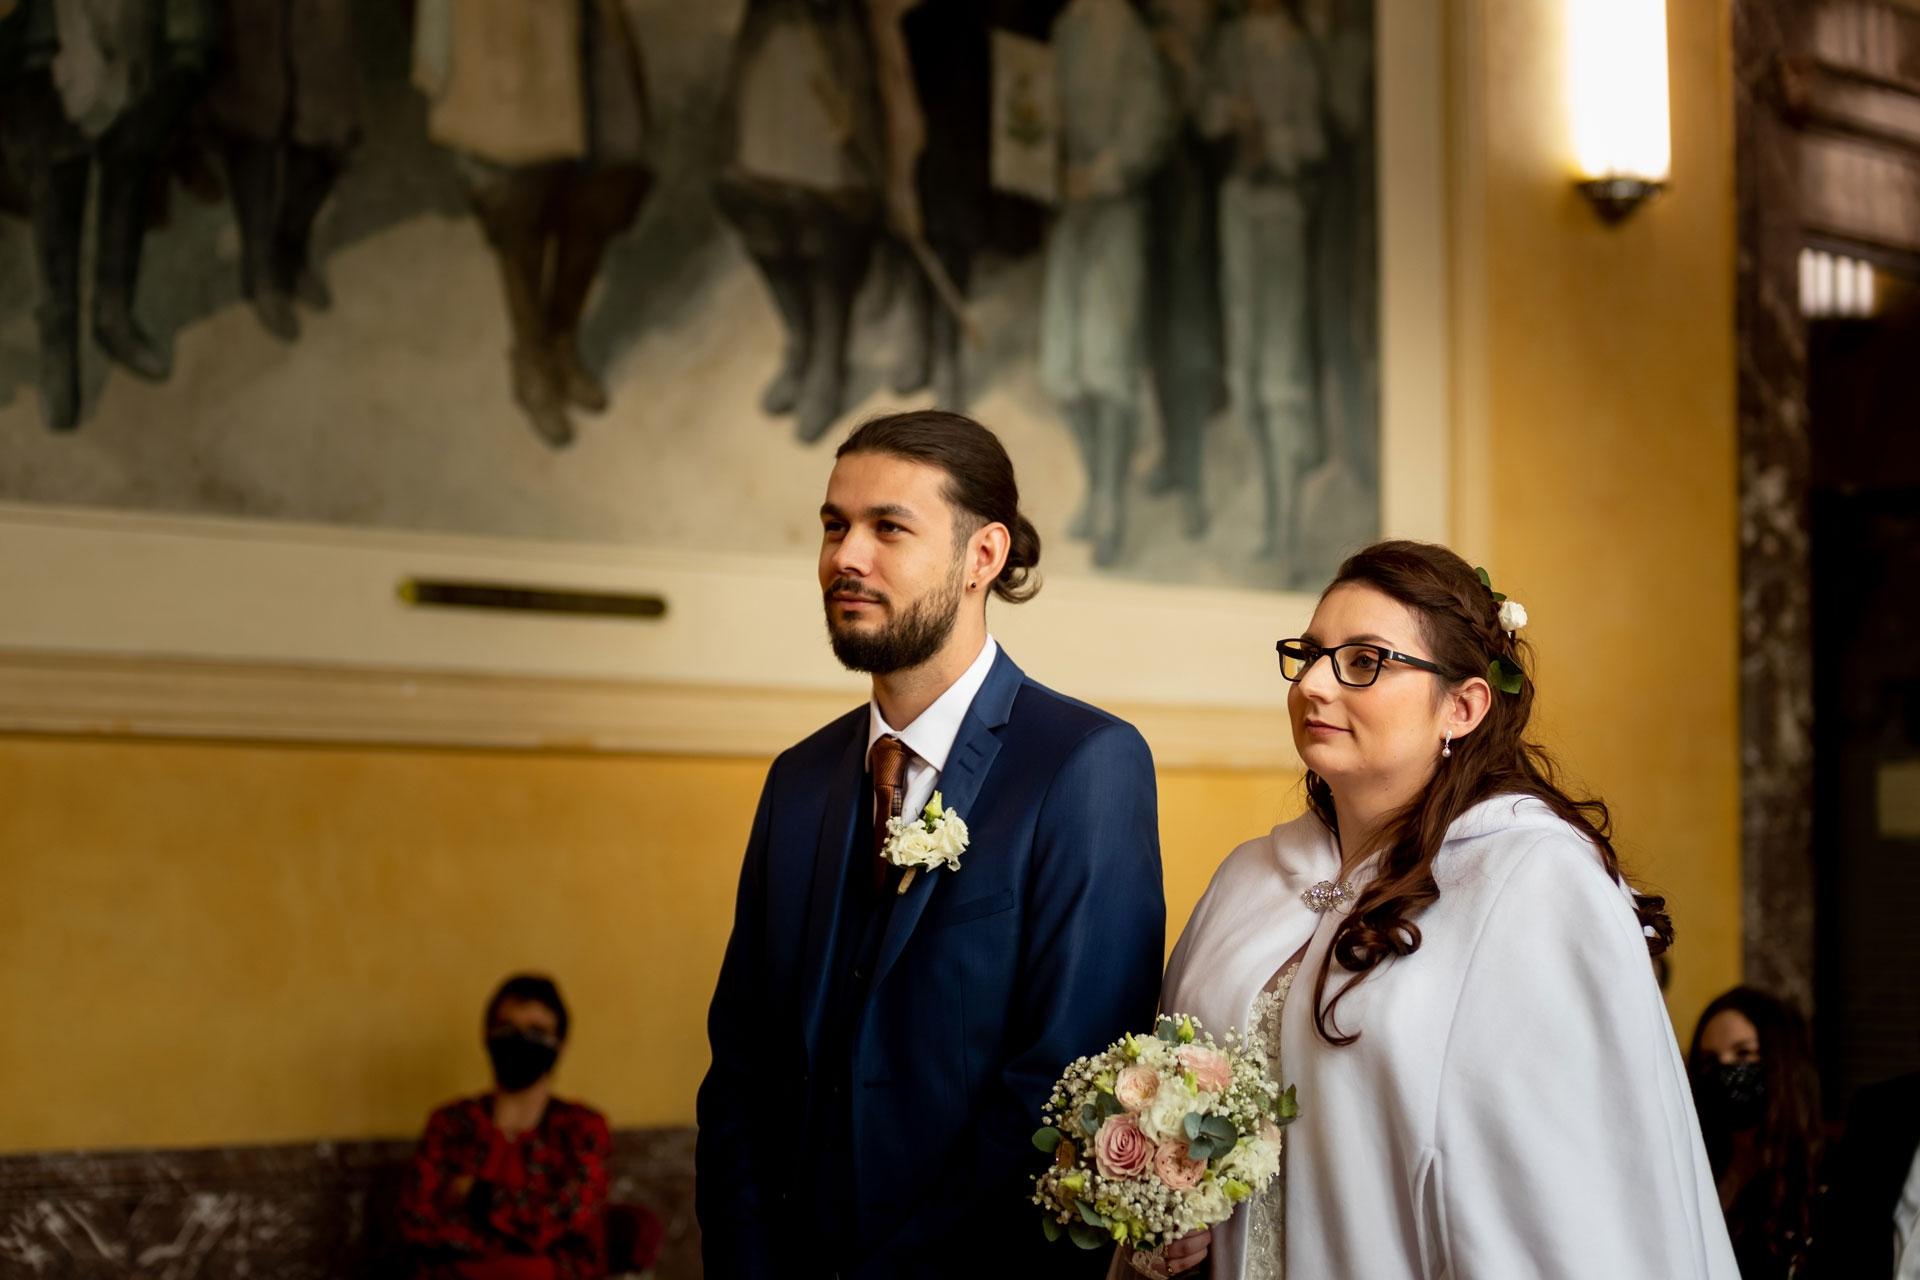 20201017-mariage-justine-alexandre-11